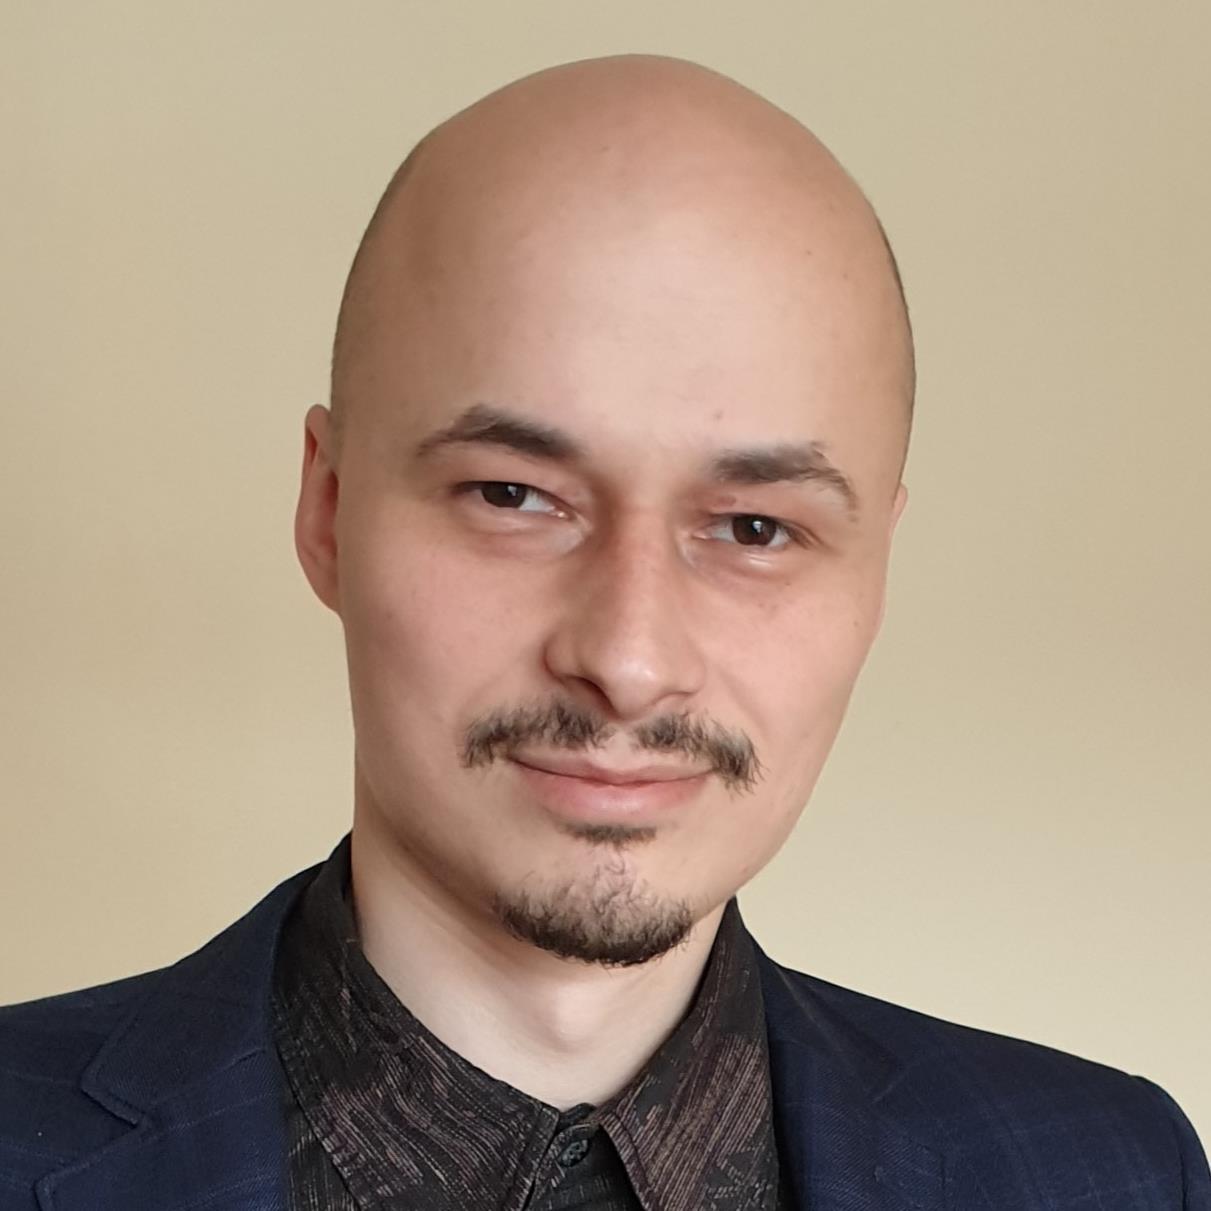 Кураков Артур.jpg